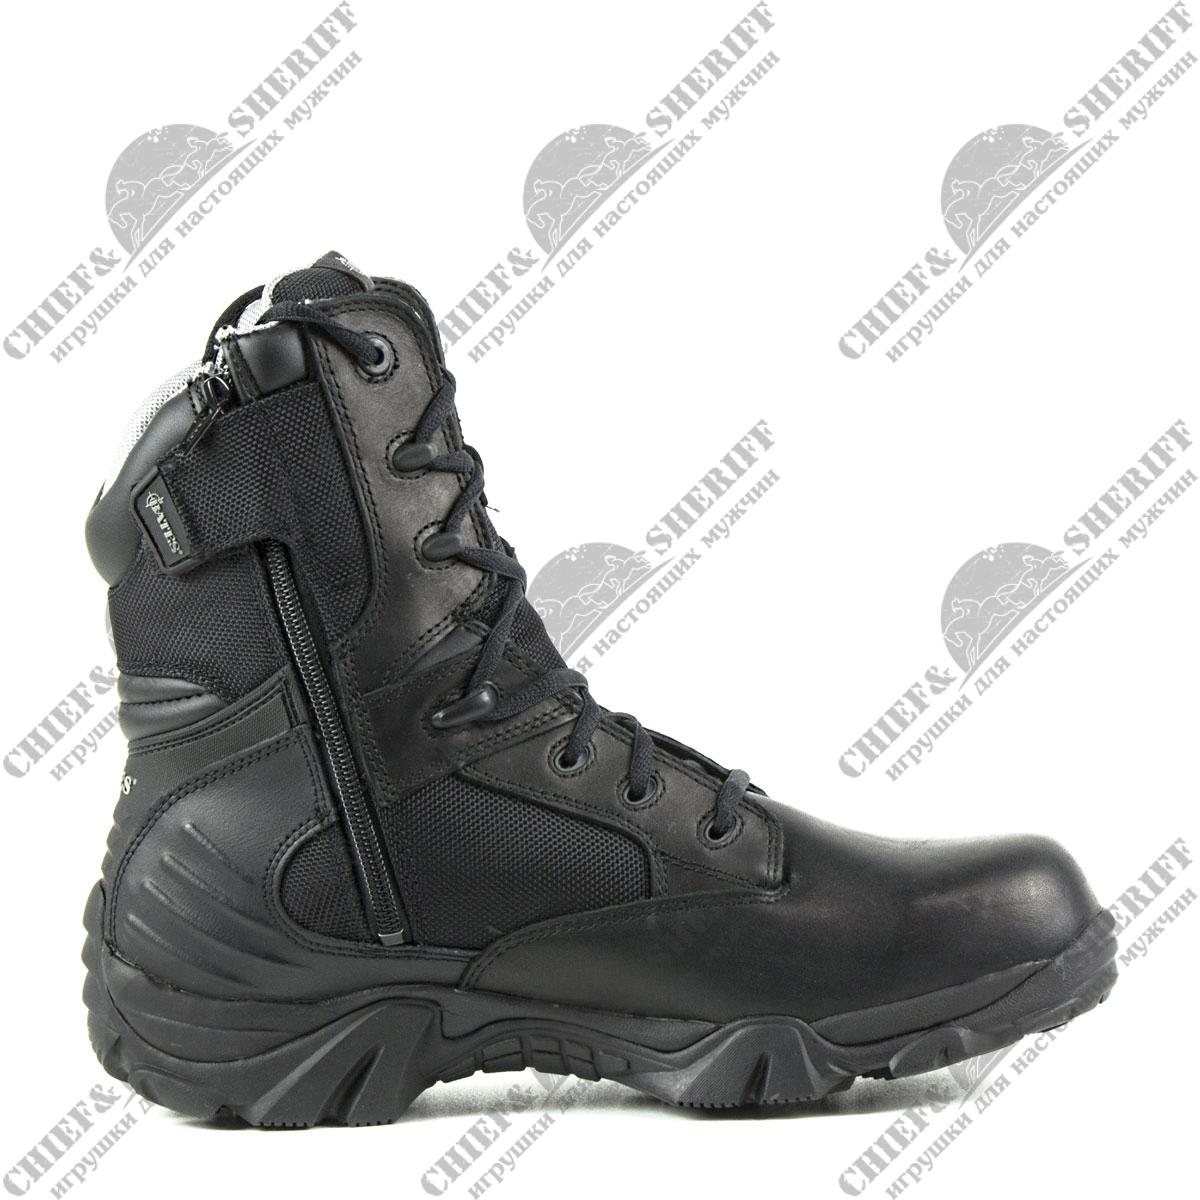 e342f7b8 Ботинки Bates (берцы), GX-8 Gore-Tex Sid Zip, black, 2268 цена 6 495 ...